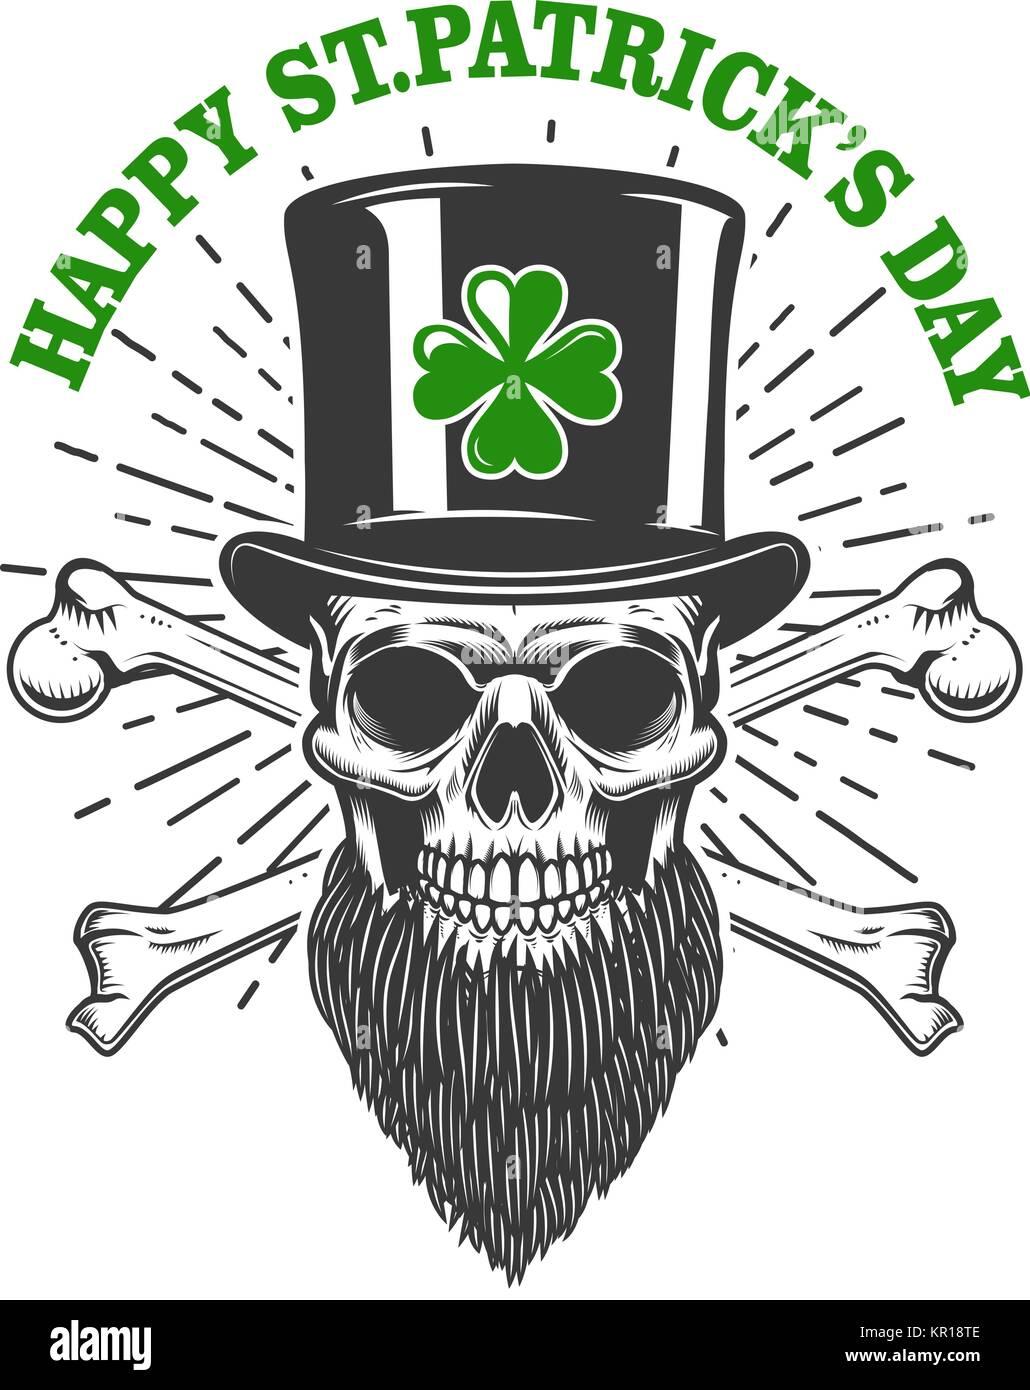 4077bbd5e Happy saint patrick day. Irish Leprechaun skull with clover. Design element  for poster,